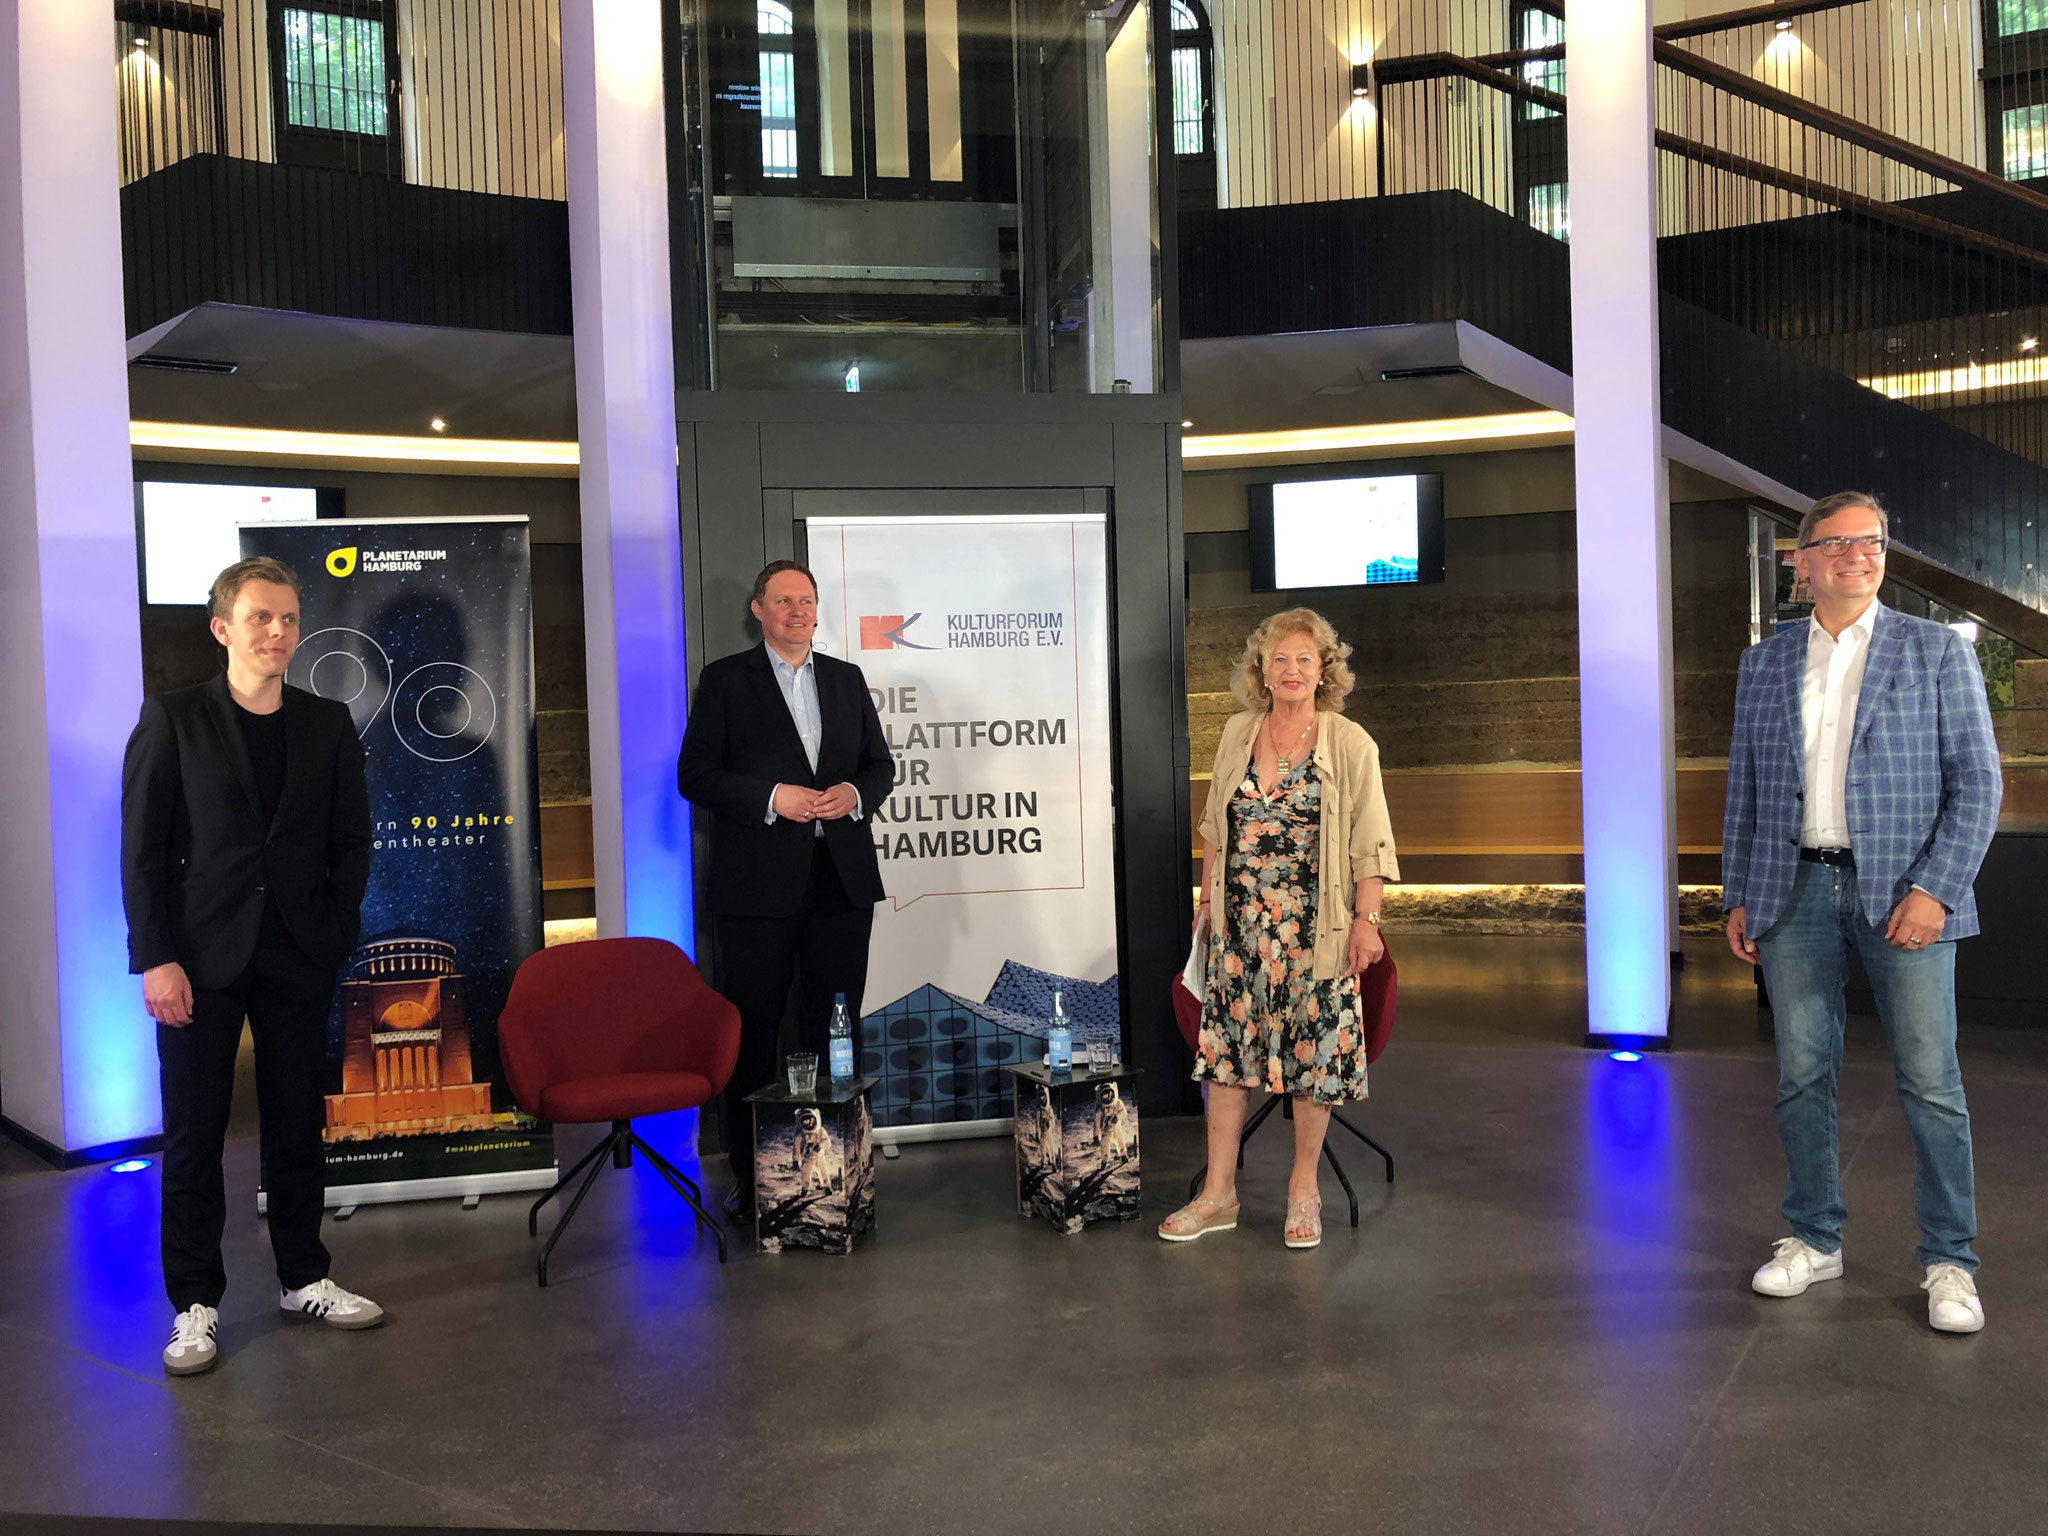 Kultur und Corona, Dr. Carsten Brosda beim Kulturforum Hamburg – Livestream aus dem Planetarium Hamburg, Juni 2020